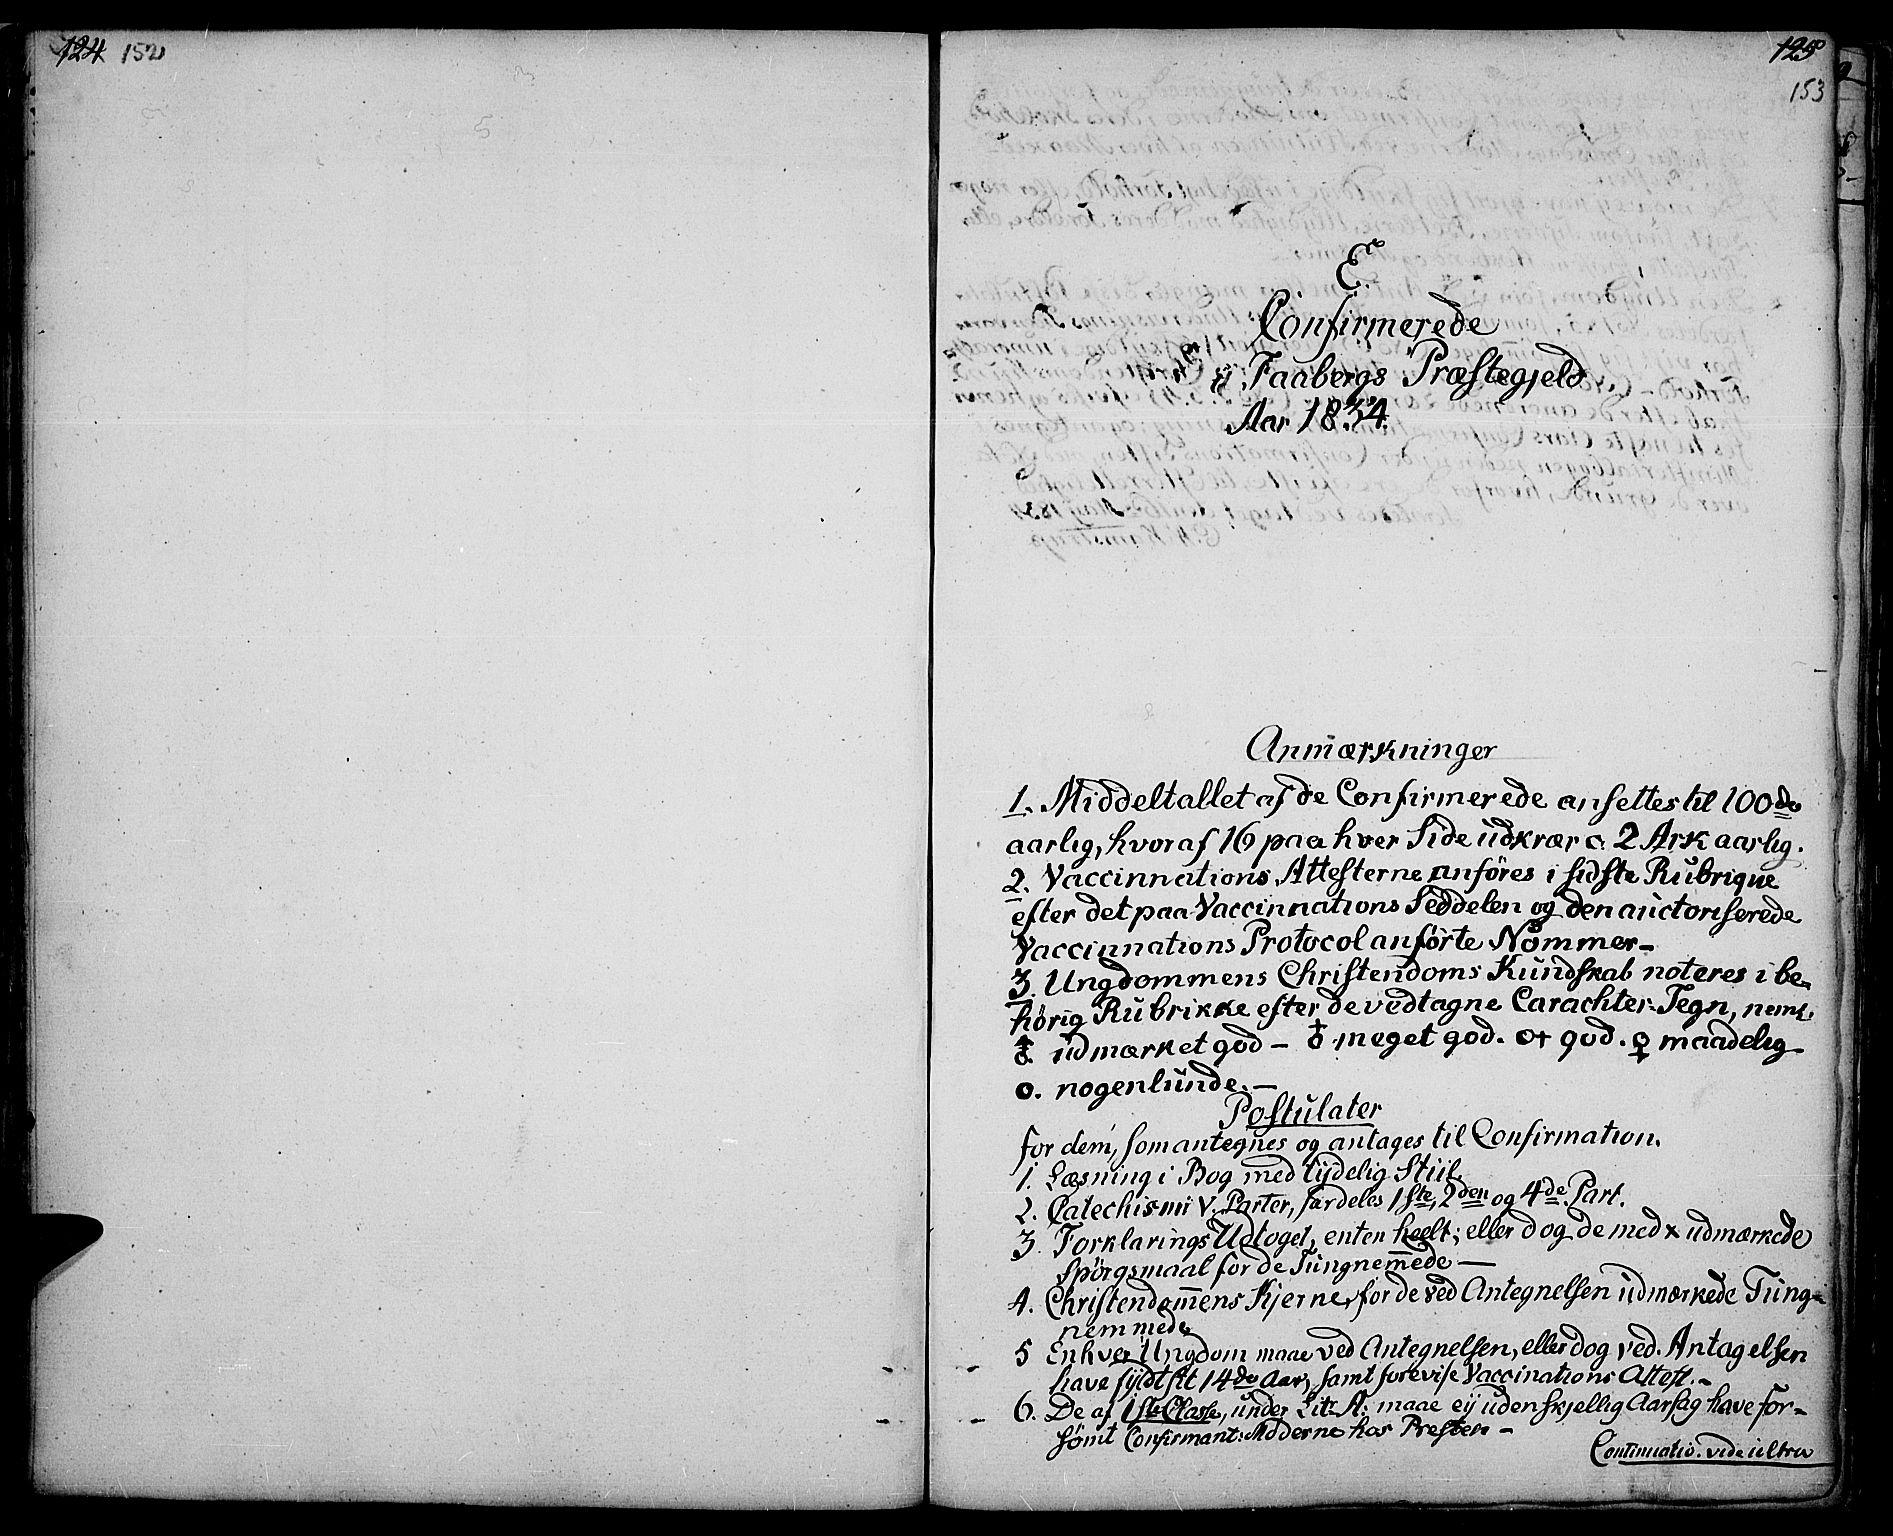 SAH, Fåberg prestekontor, Ministerialbok nr. 4, 1833-1837, s. 152-153